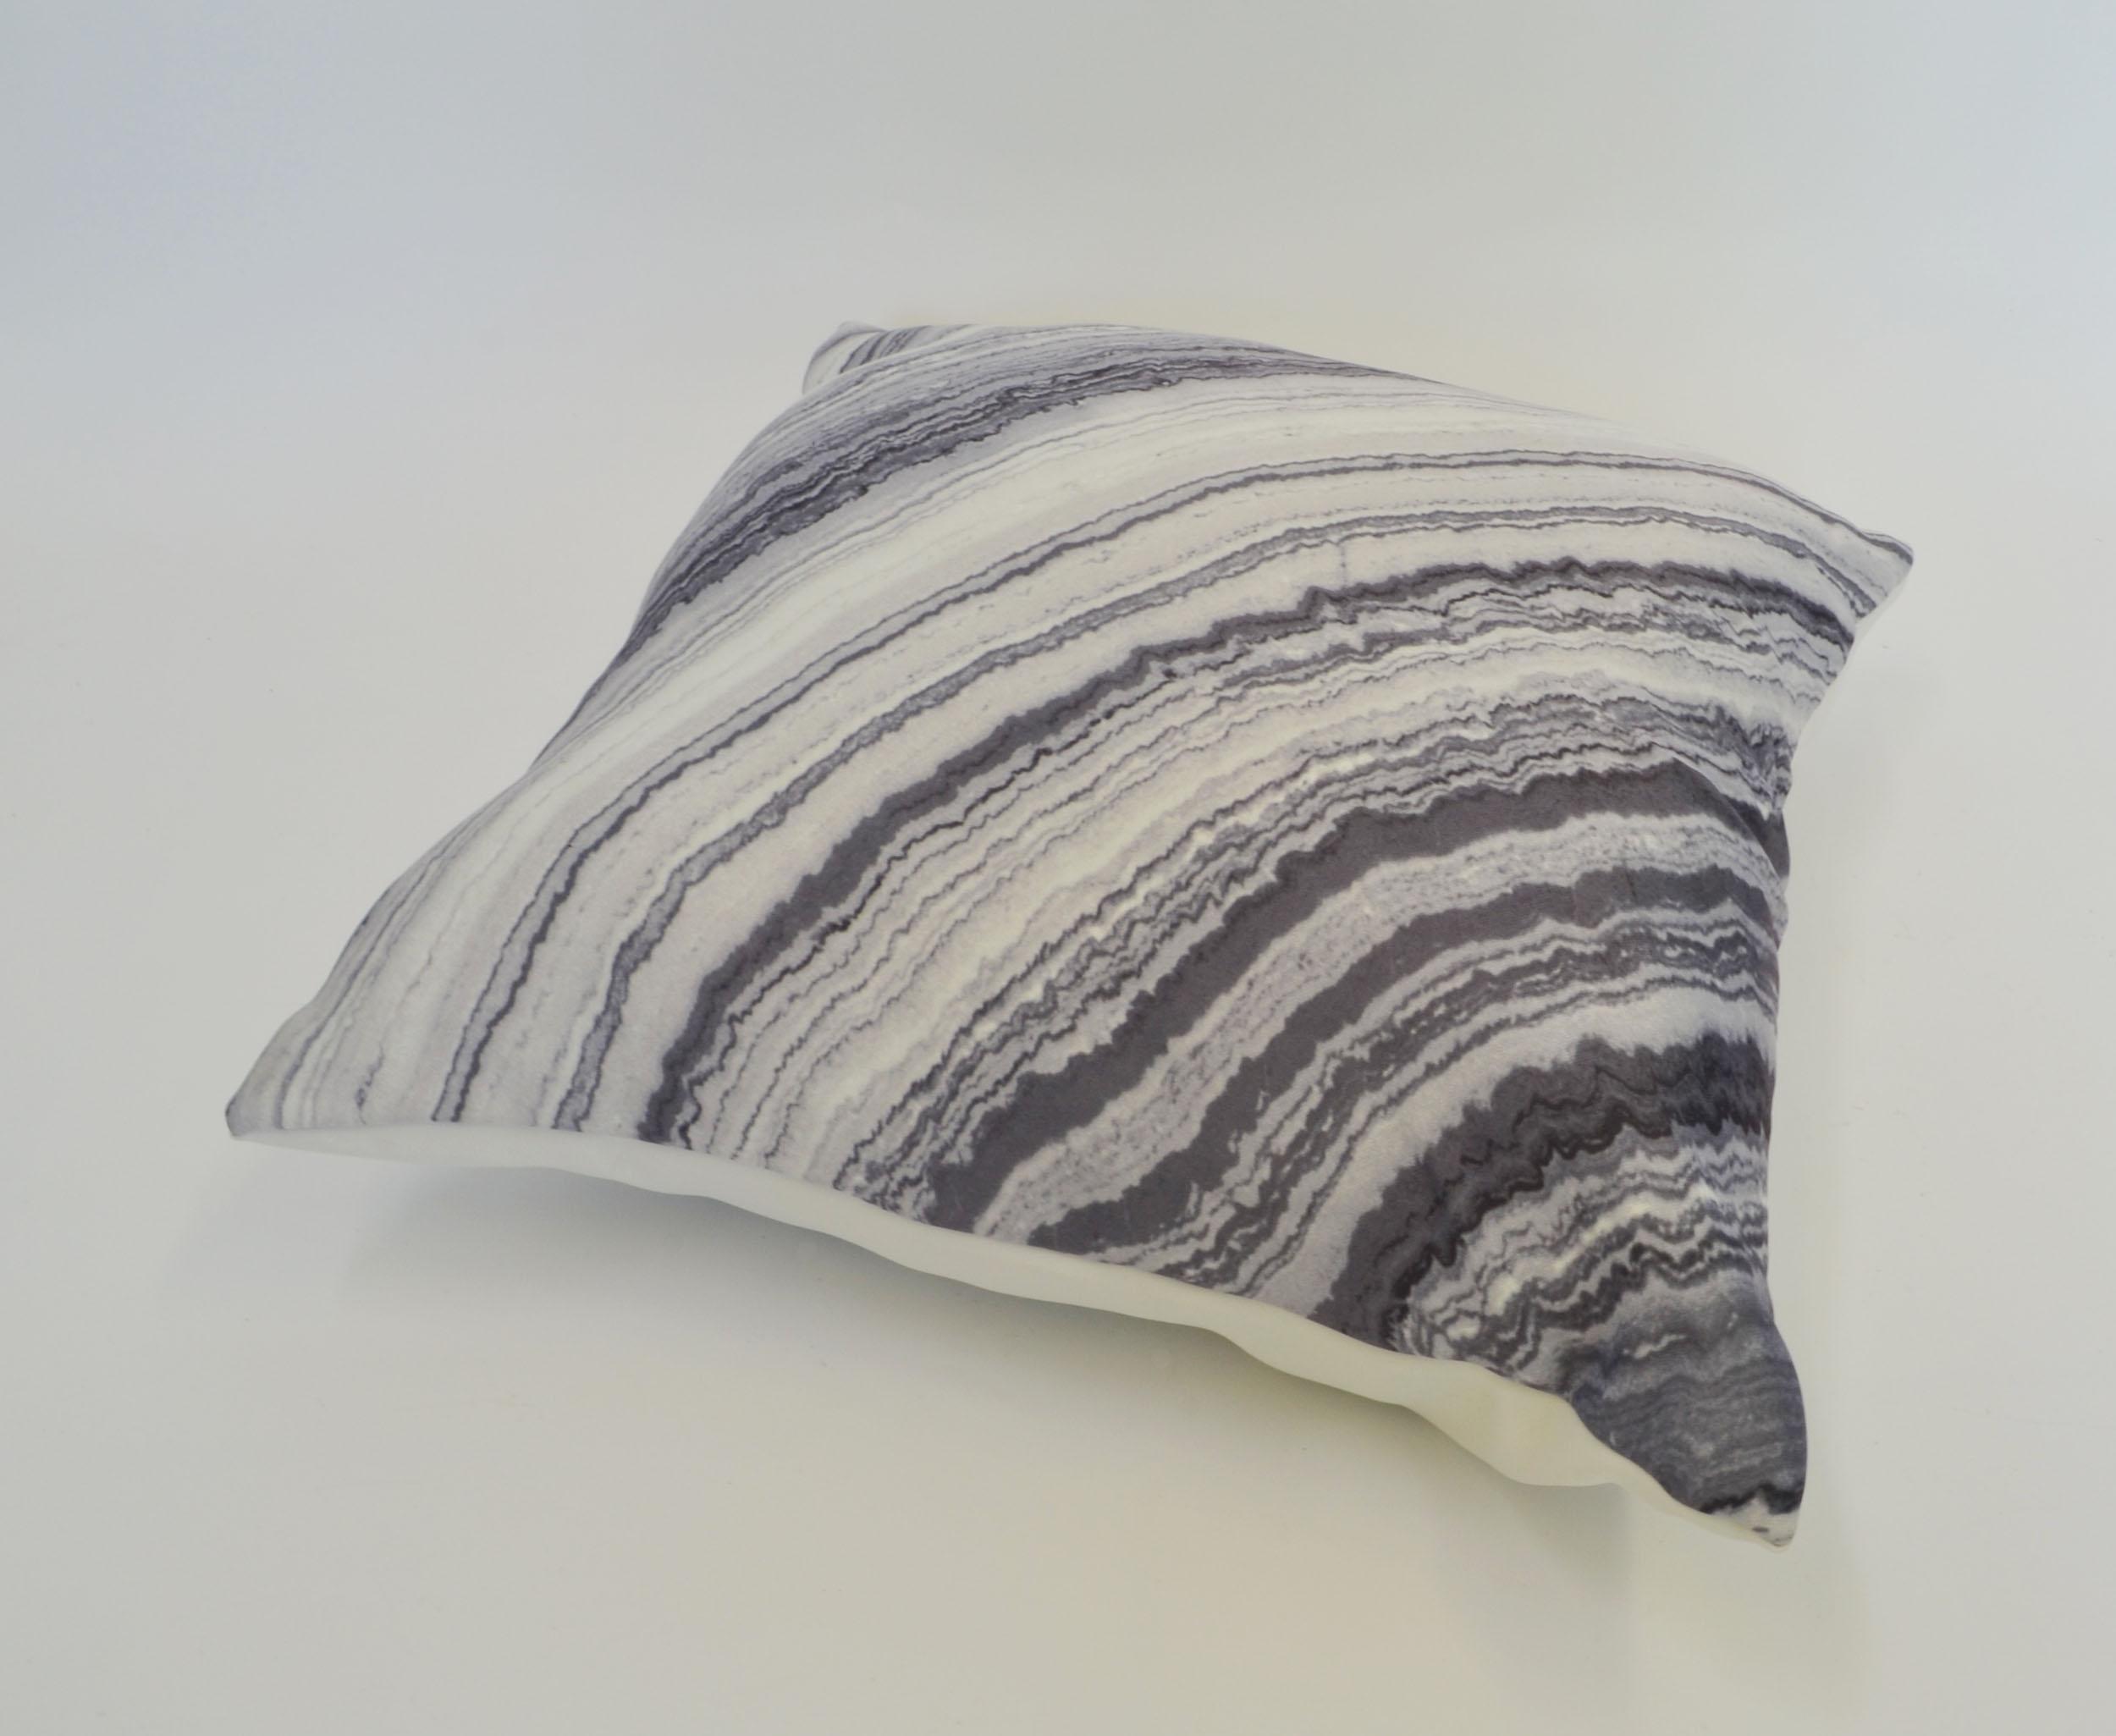 grey agate pillow   Quantity: 2  Price: $10.00